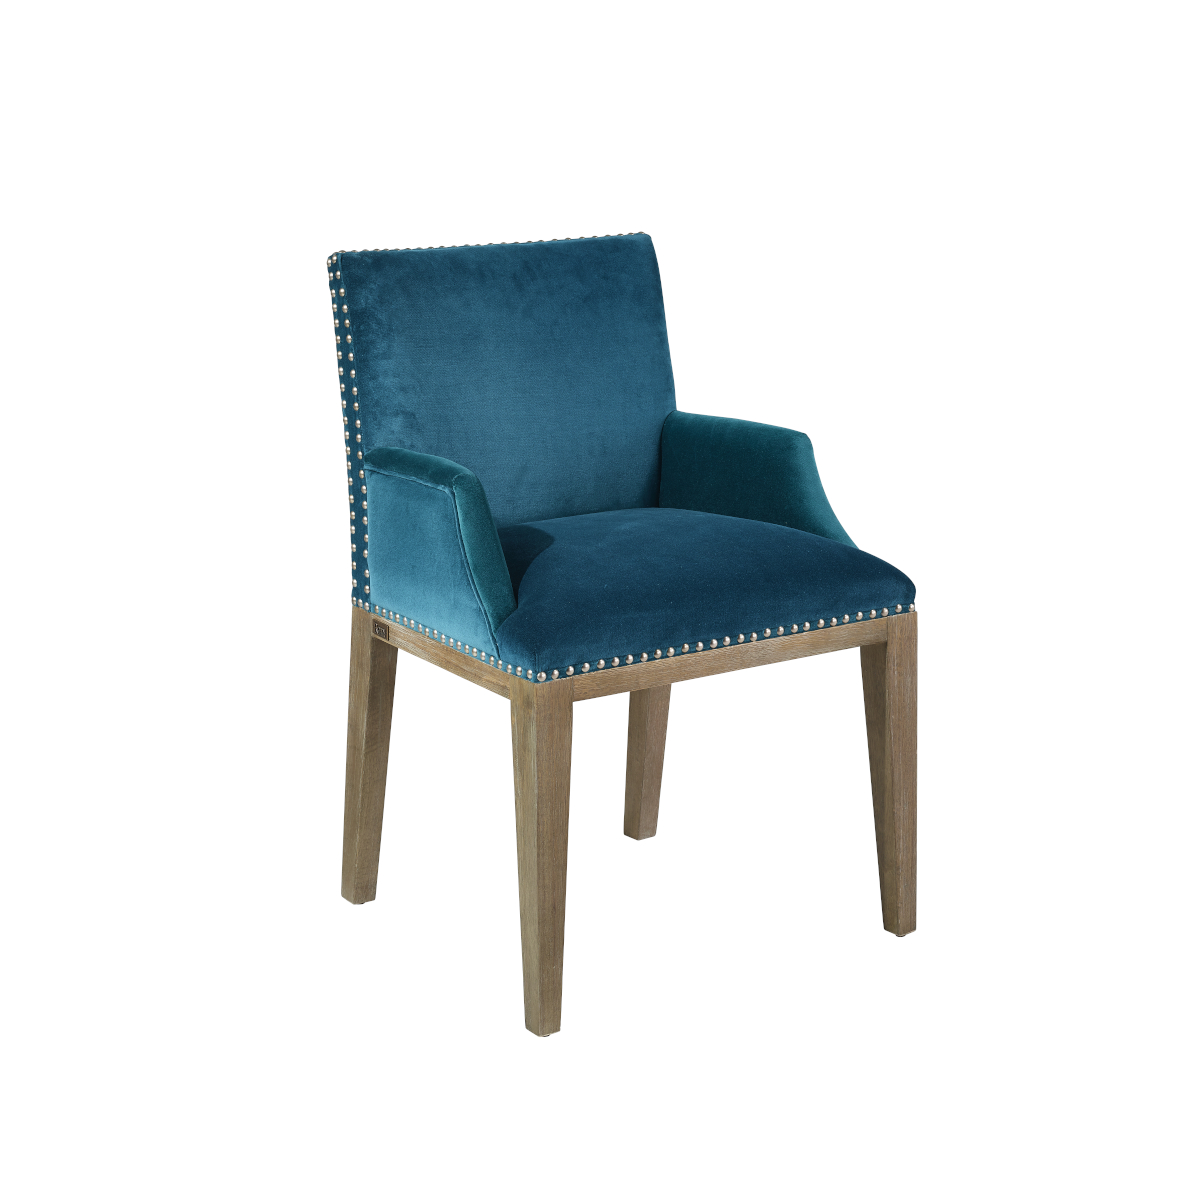 Fauteuil de table en velours bleu canard